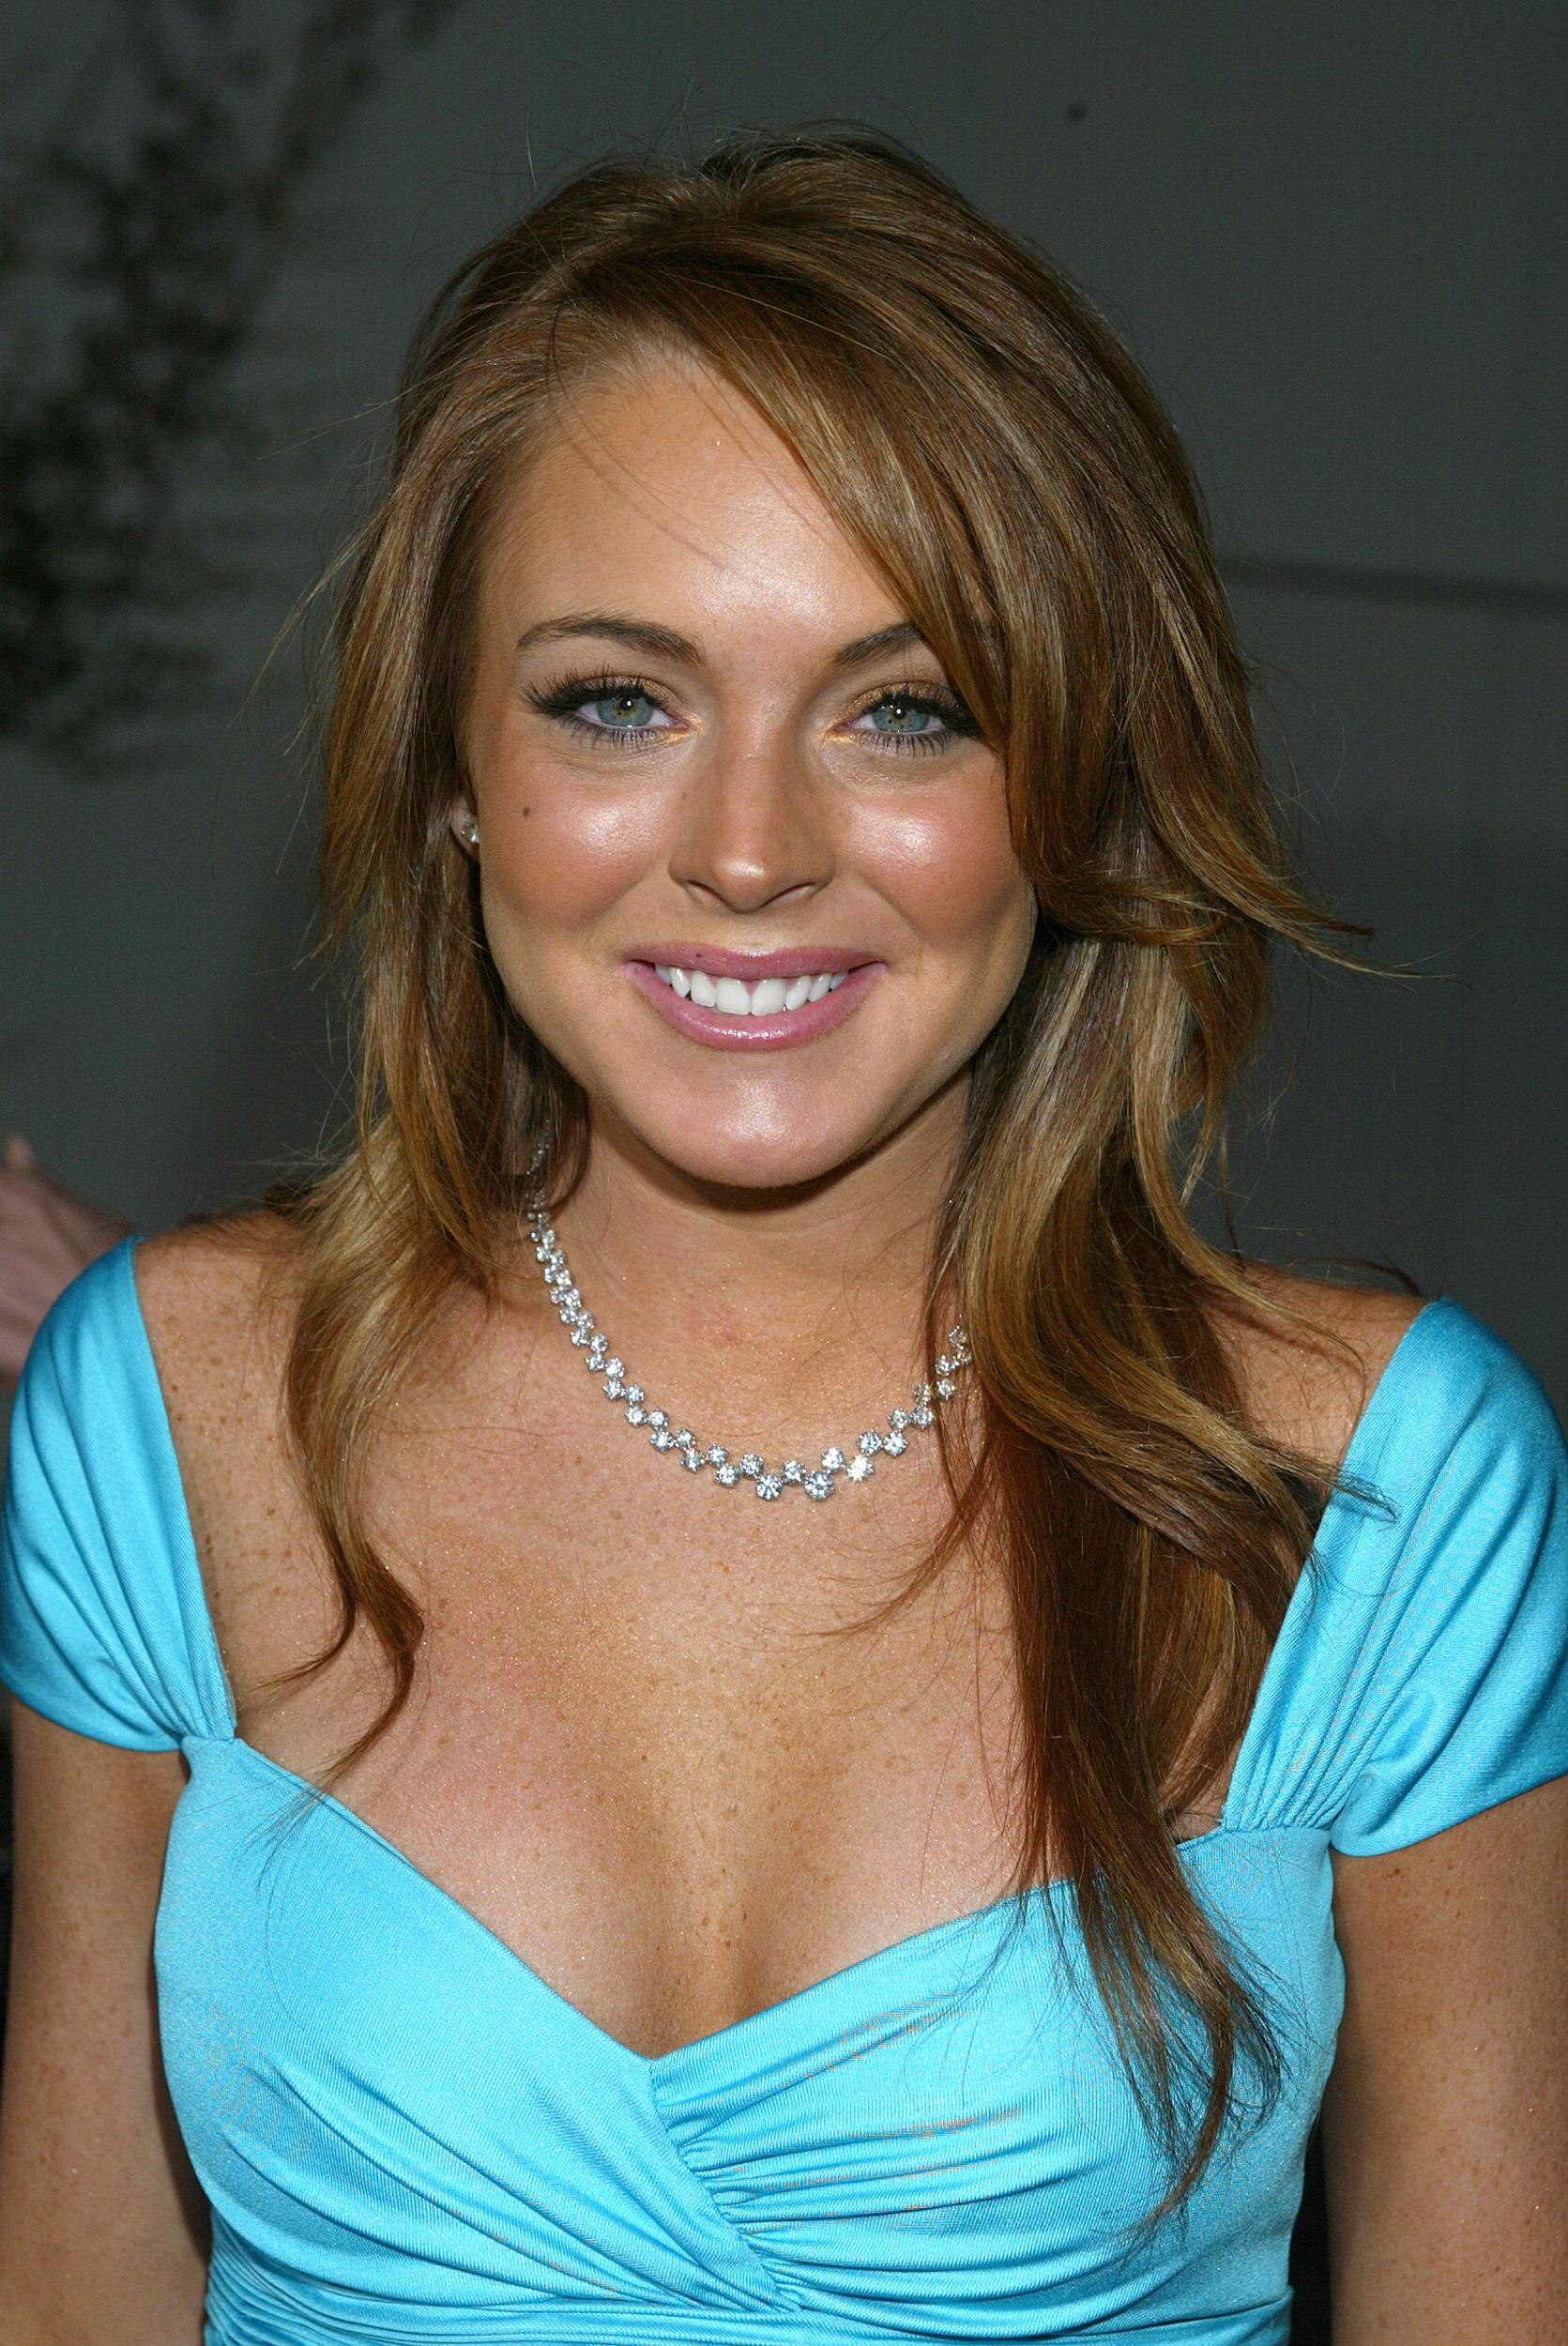 Lindsay Lohan Boob job...